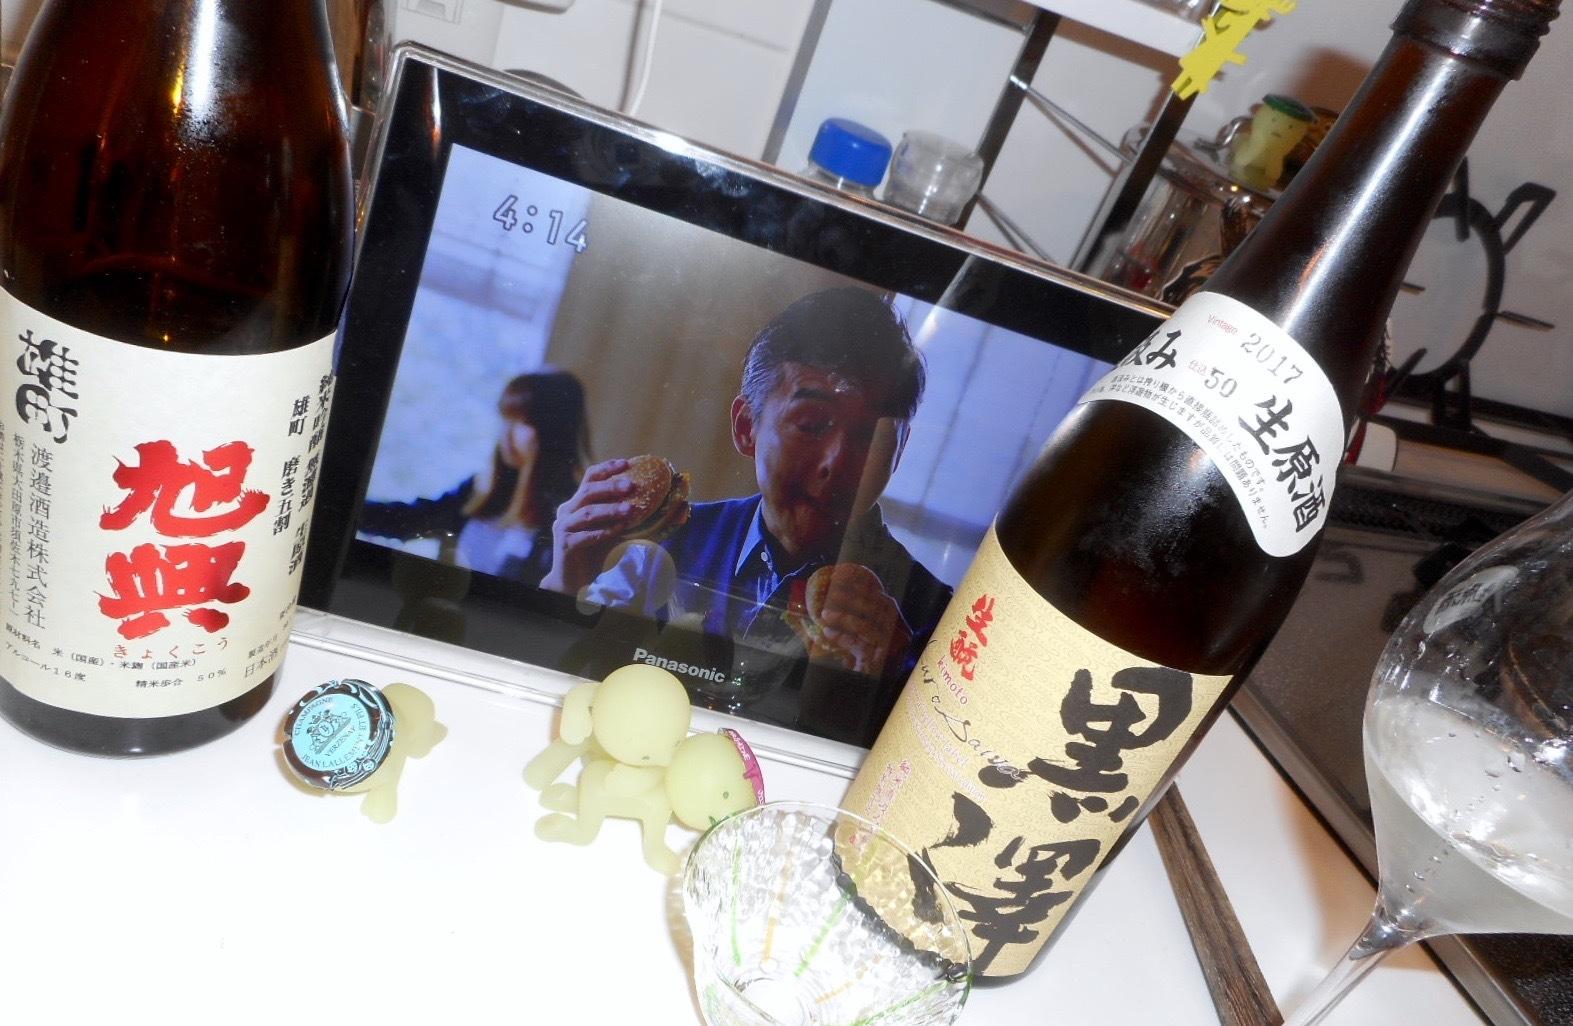 kyokukou_omachi50namagen29by7.jpg